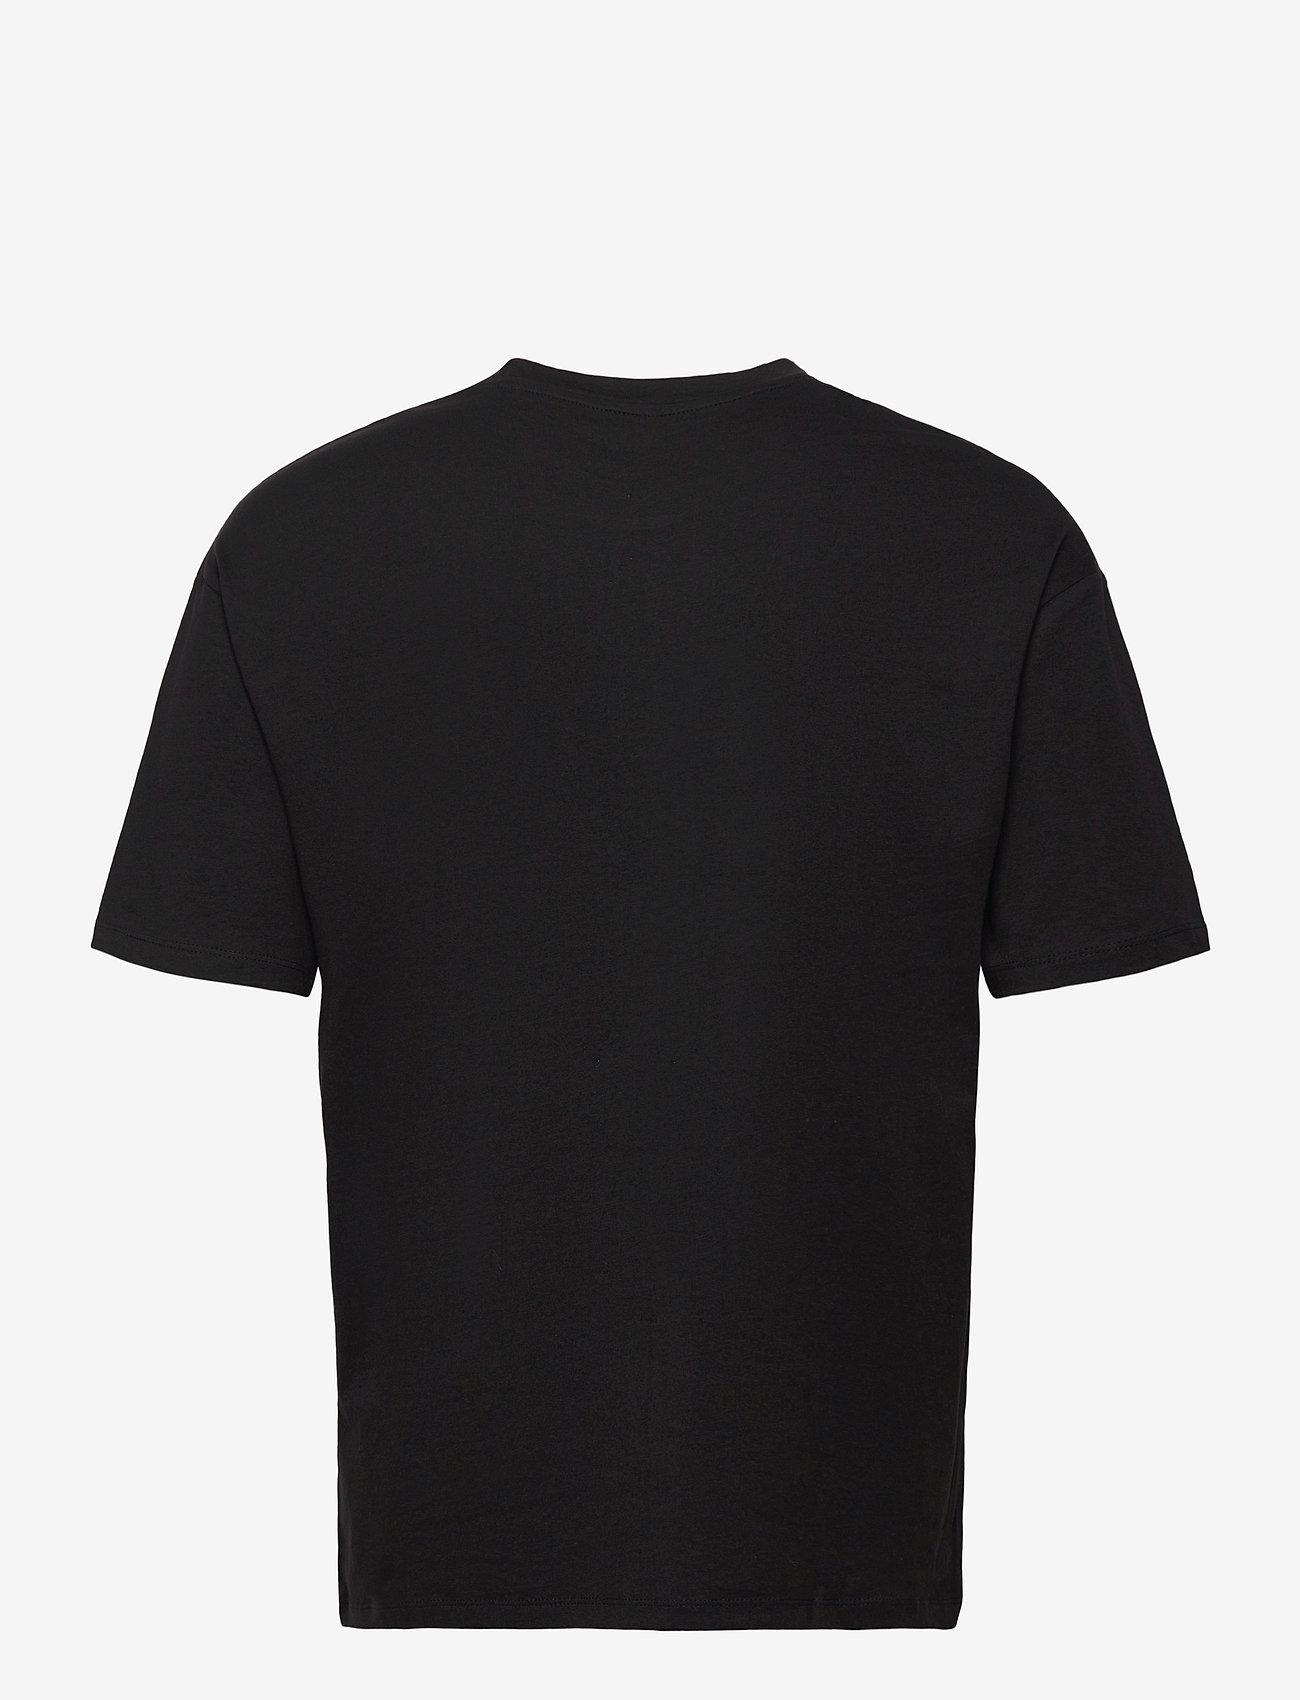 Jack & Jones - JORBRINK TEE SS CREW NECK - basic t-shirts - black - 1